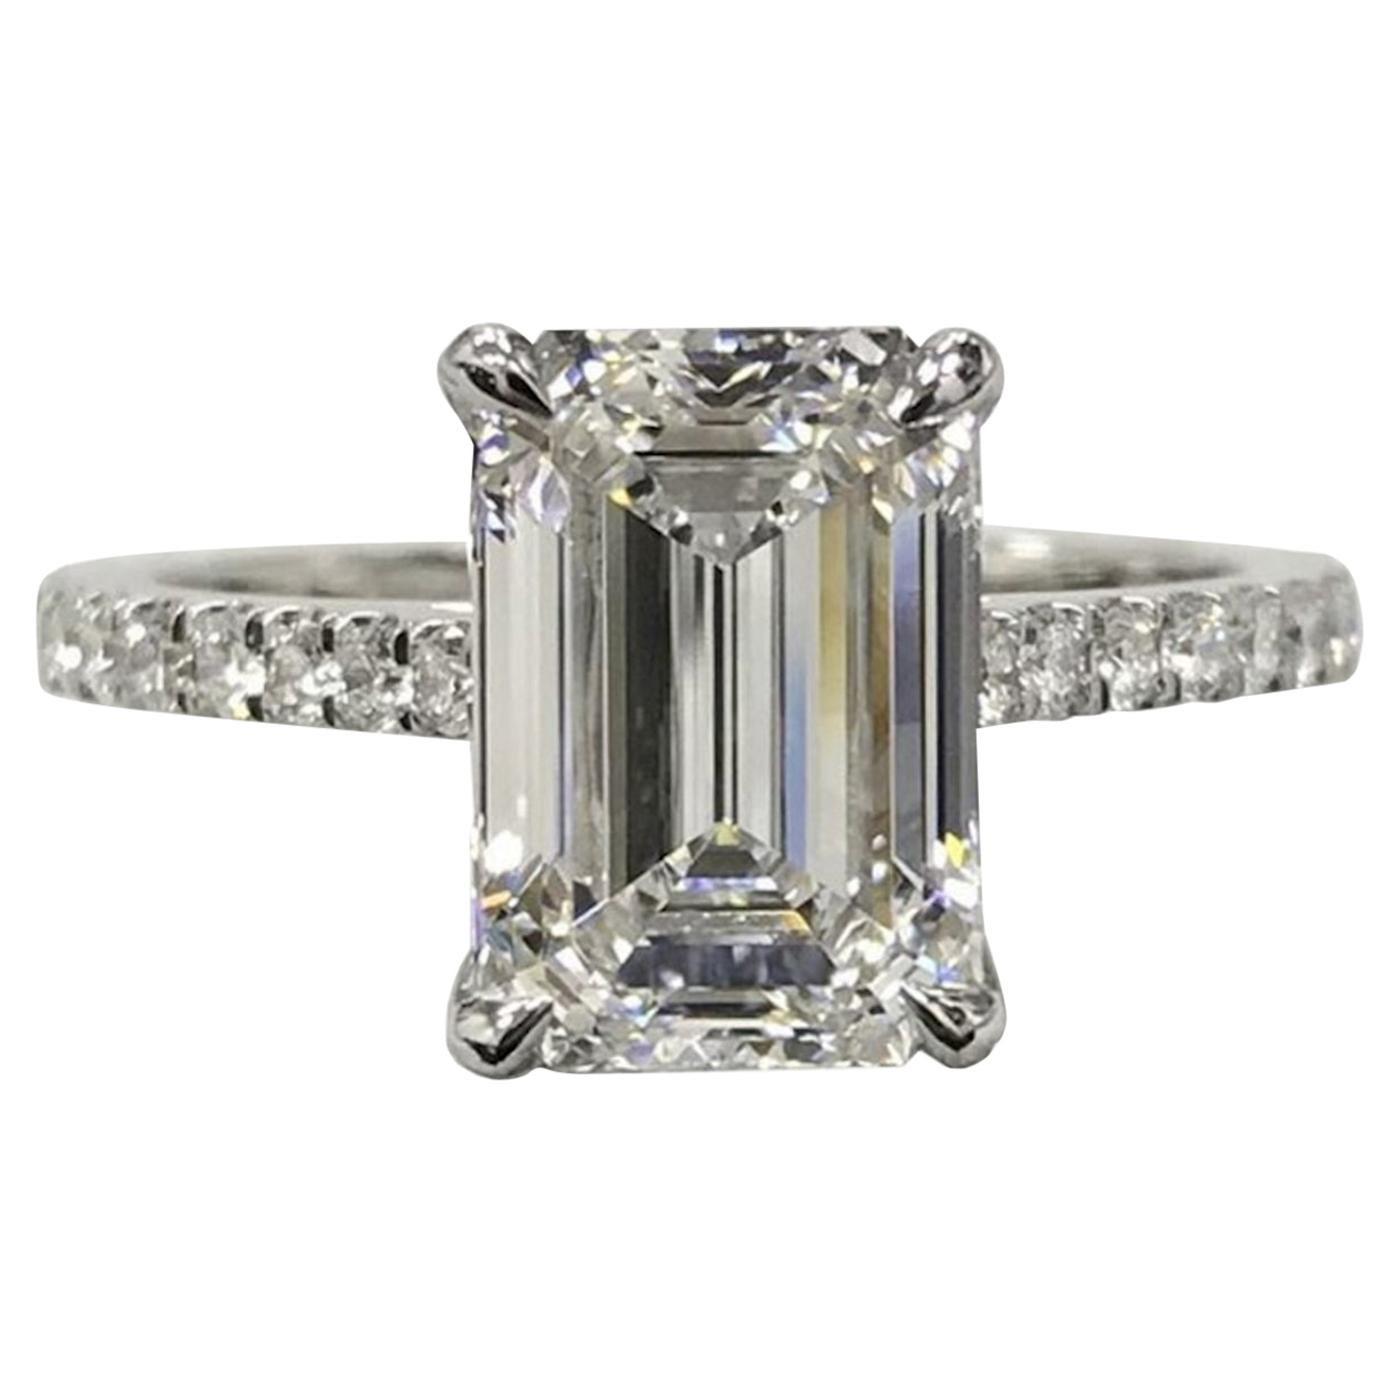 GIA Certified 3.50 Carat Emerald Cut VS2 Clarity E Color Diamond Ring